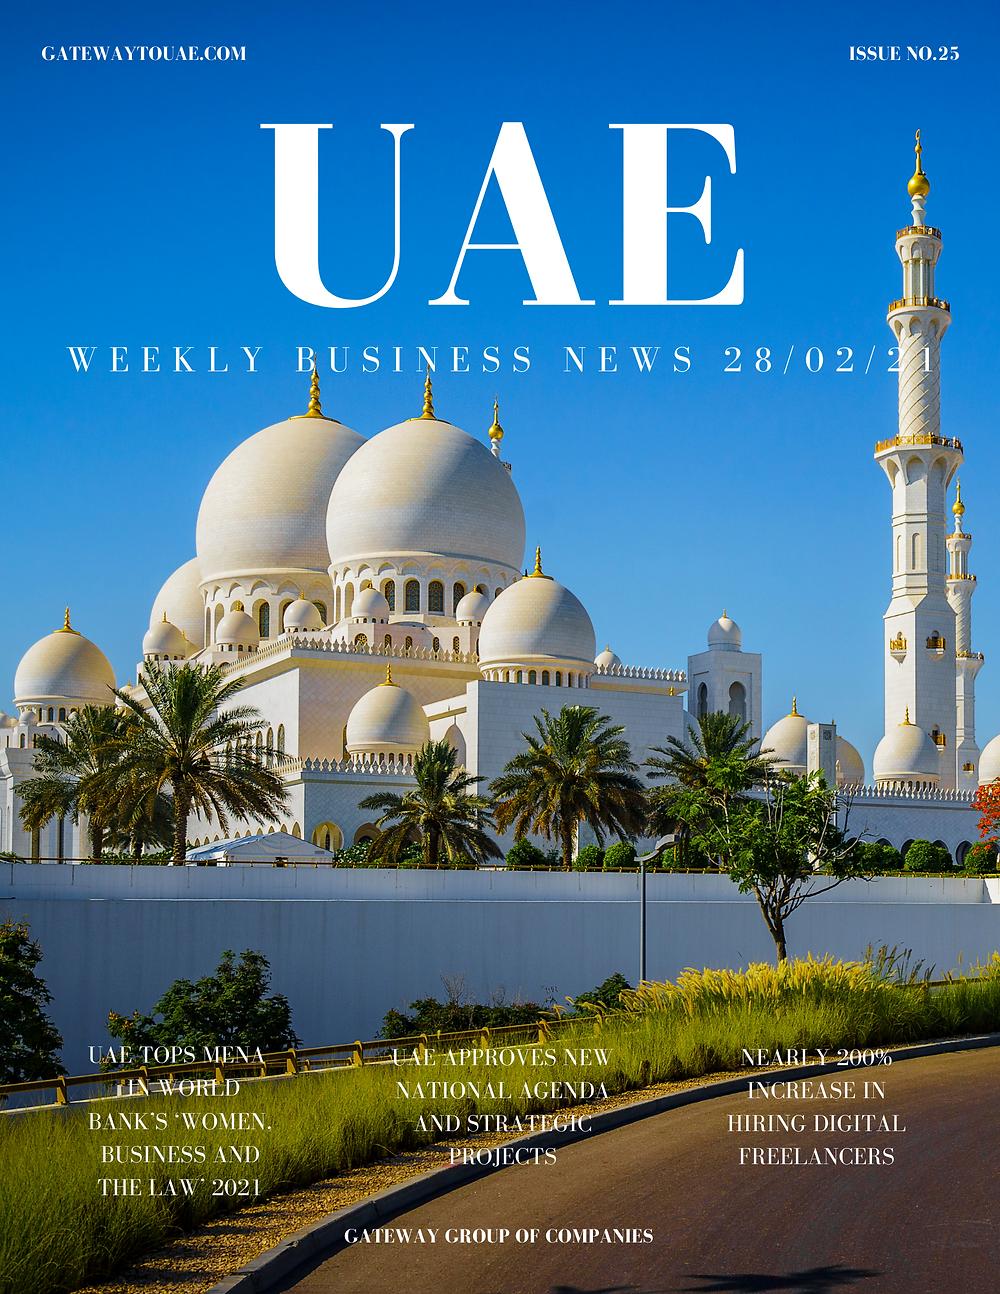 UAE weekly business news headlines 28th February 2021 Issue 25 Gateway Group Of Companies Abu Dhabi Dubai weekly magazine company formation business setup local sponsor service agent visas